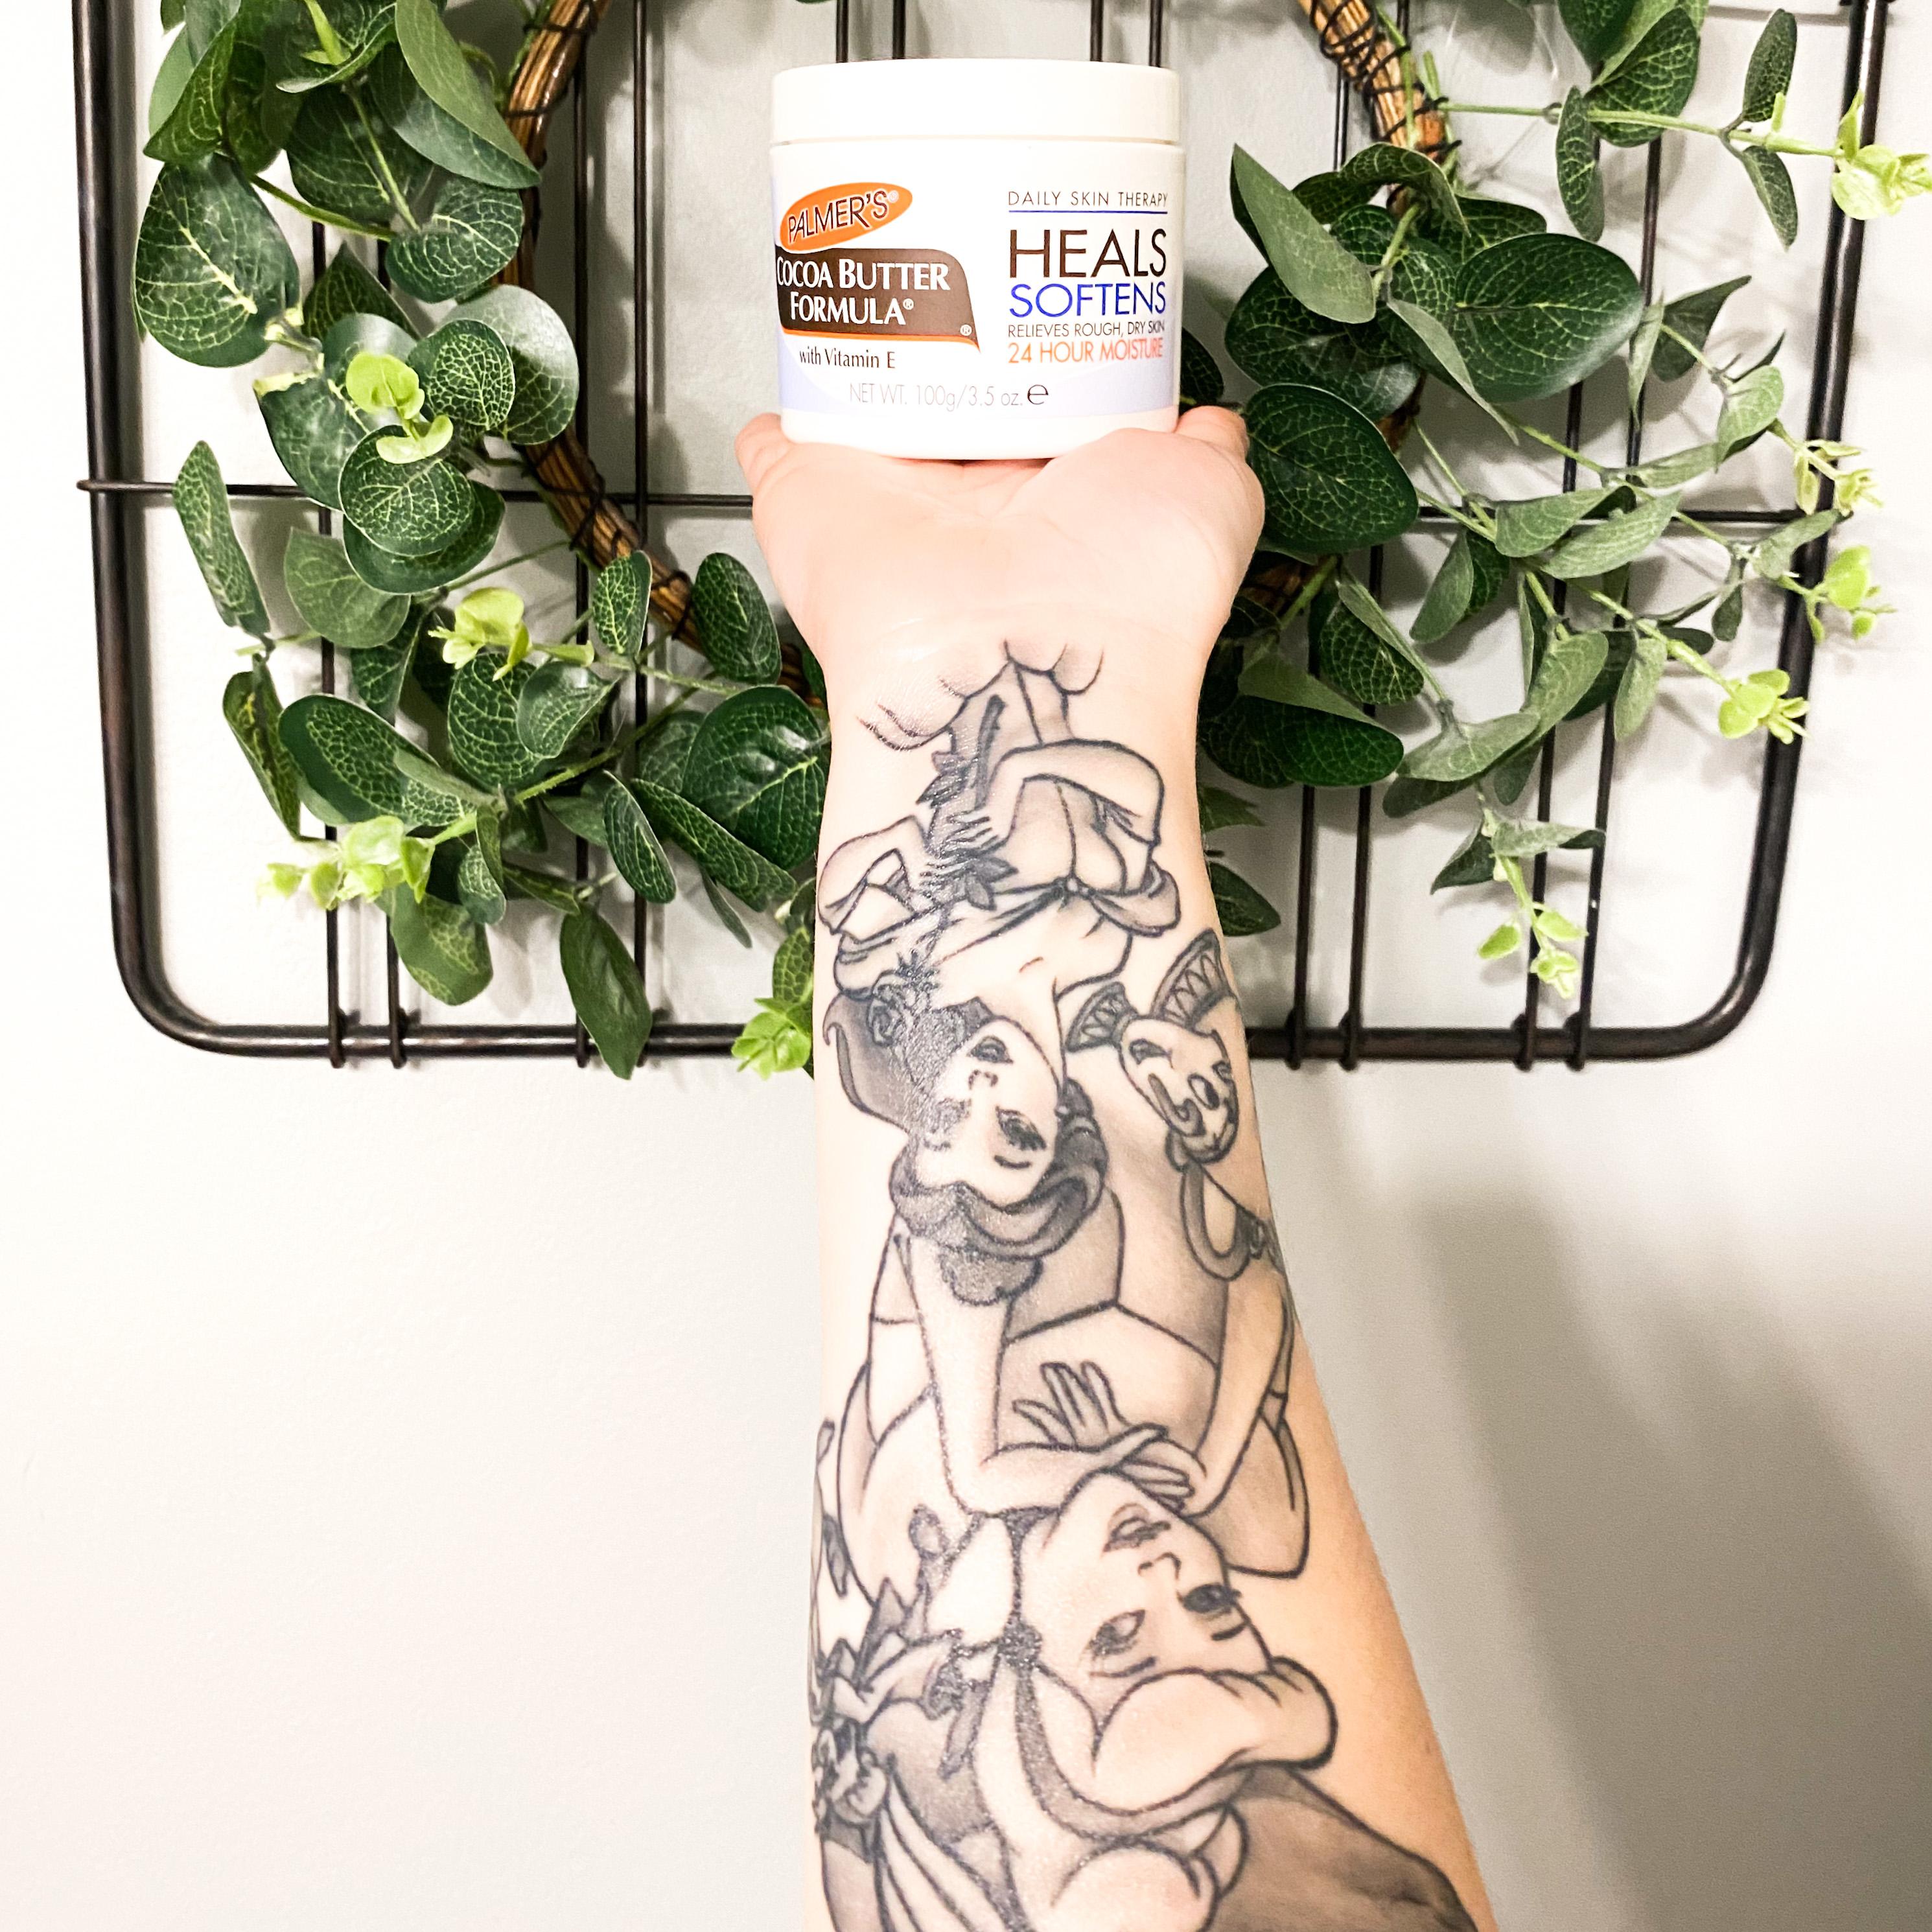 Palmer's Cocoa Butter Formula Original Solid Jar helps keep tattoos looking fresh